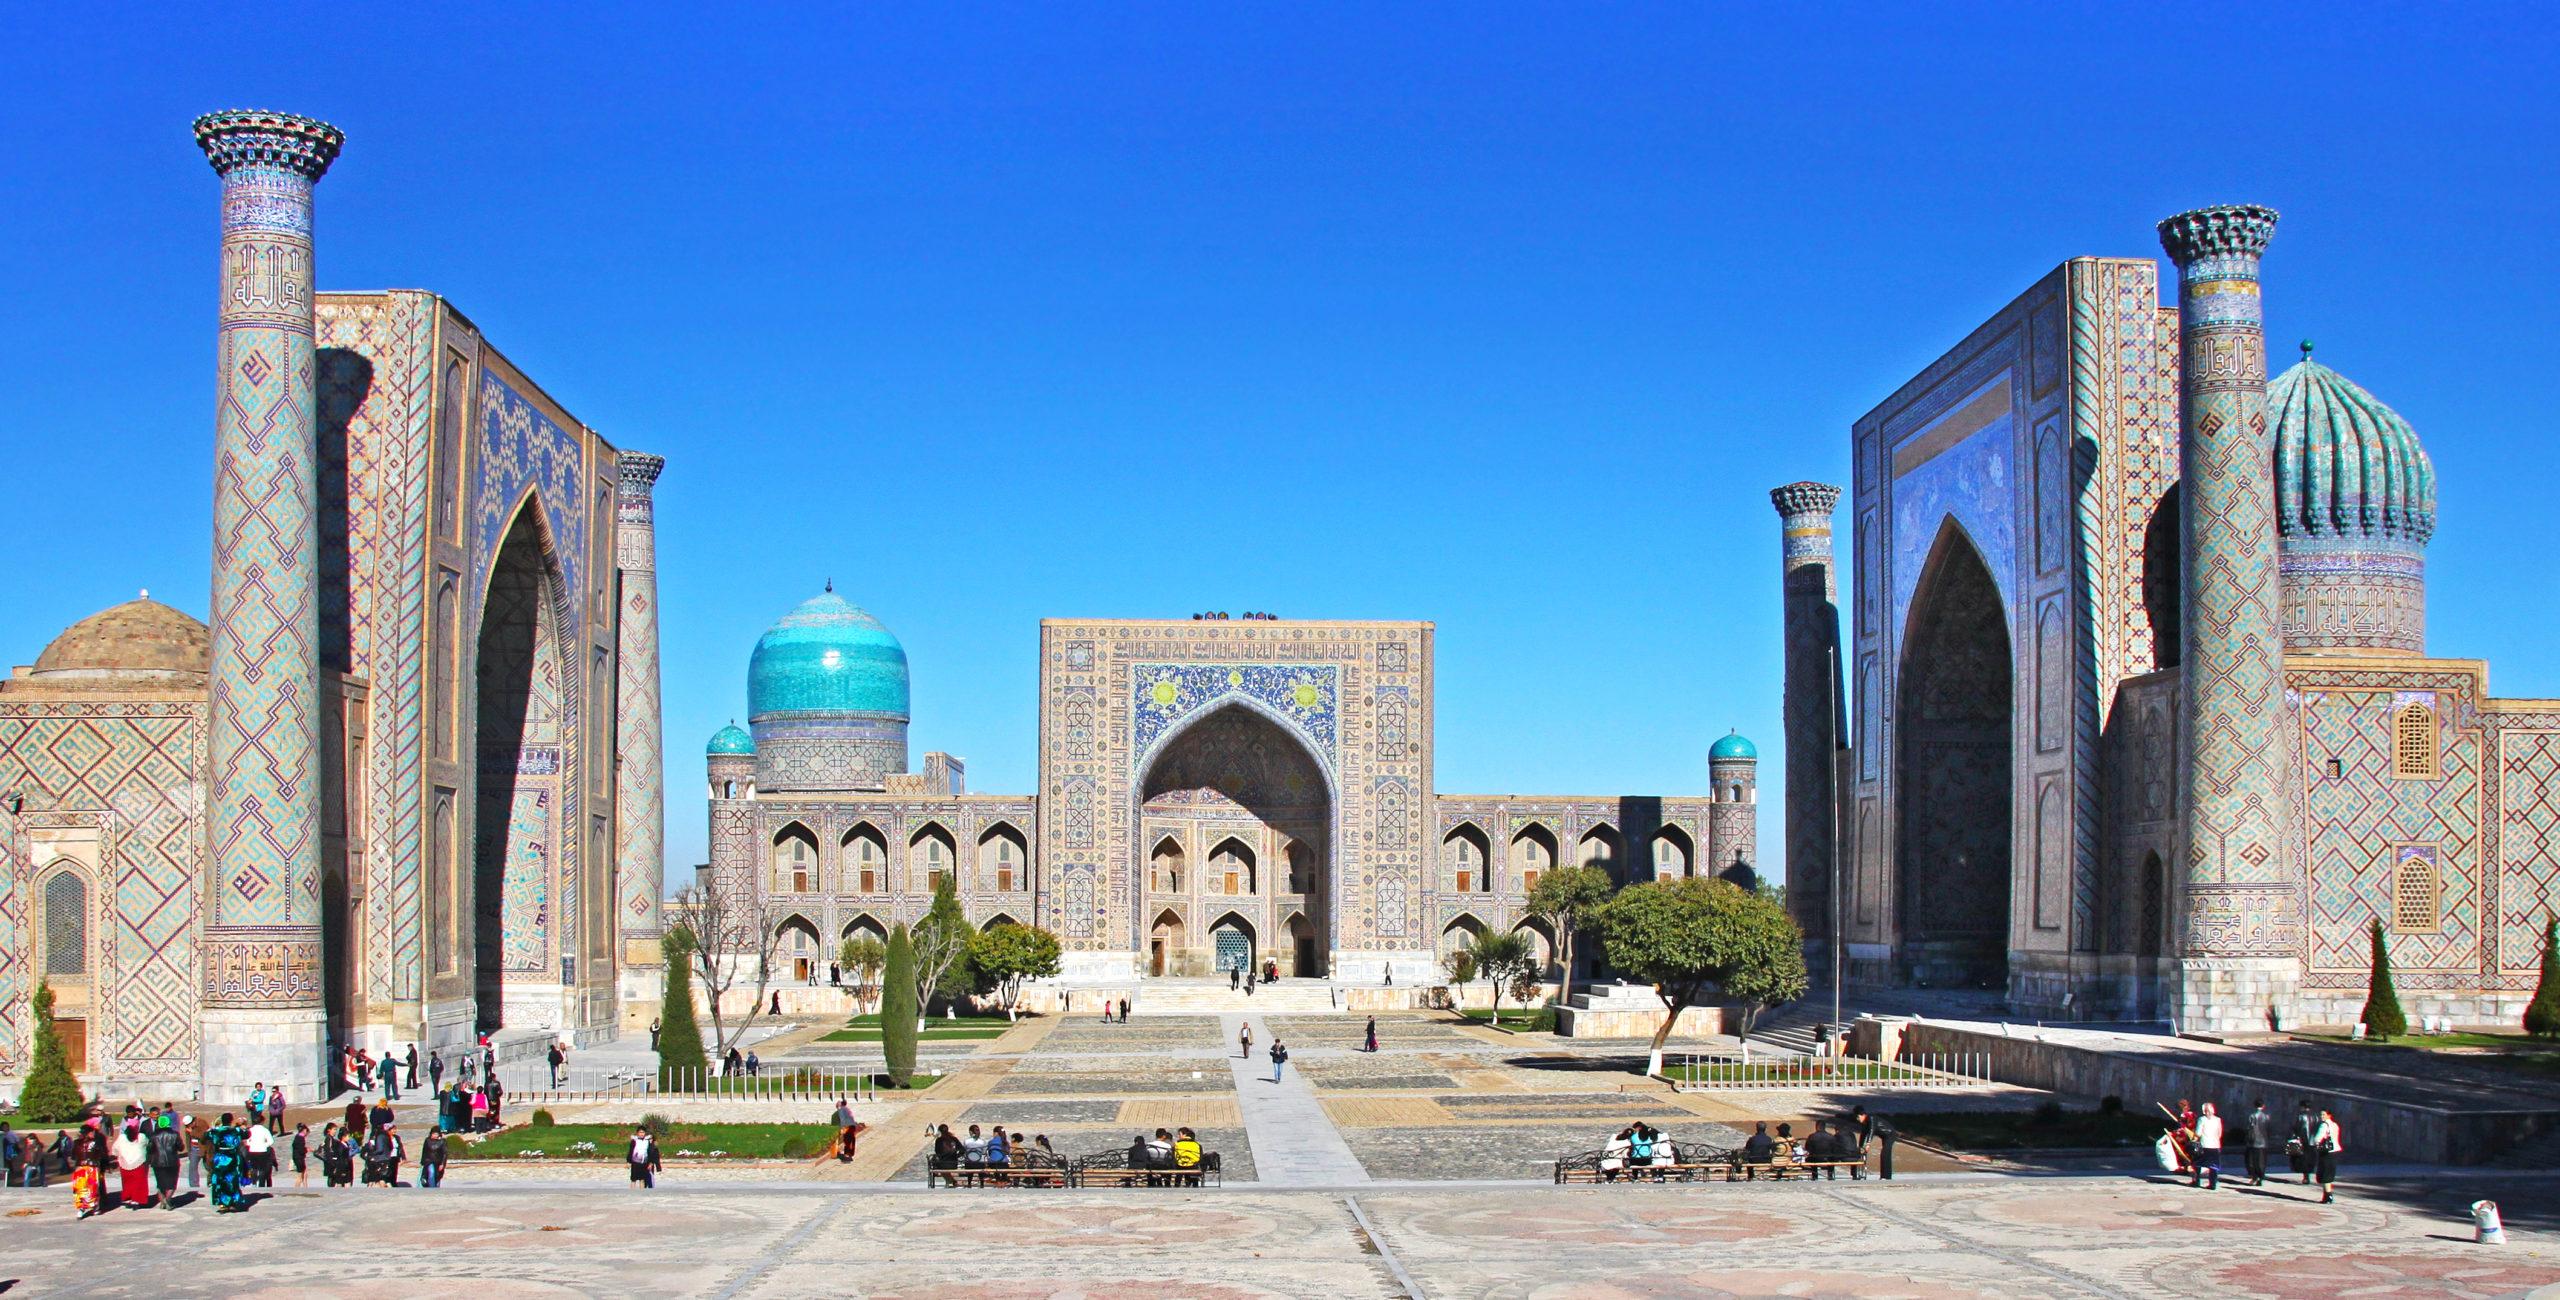 Samarkand, Uzbekistan - NOVEMBER, 10, 2016: The Registan, the heart of the ancient city of Samarkand - Uzbekistan